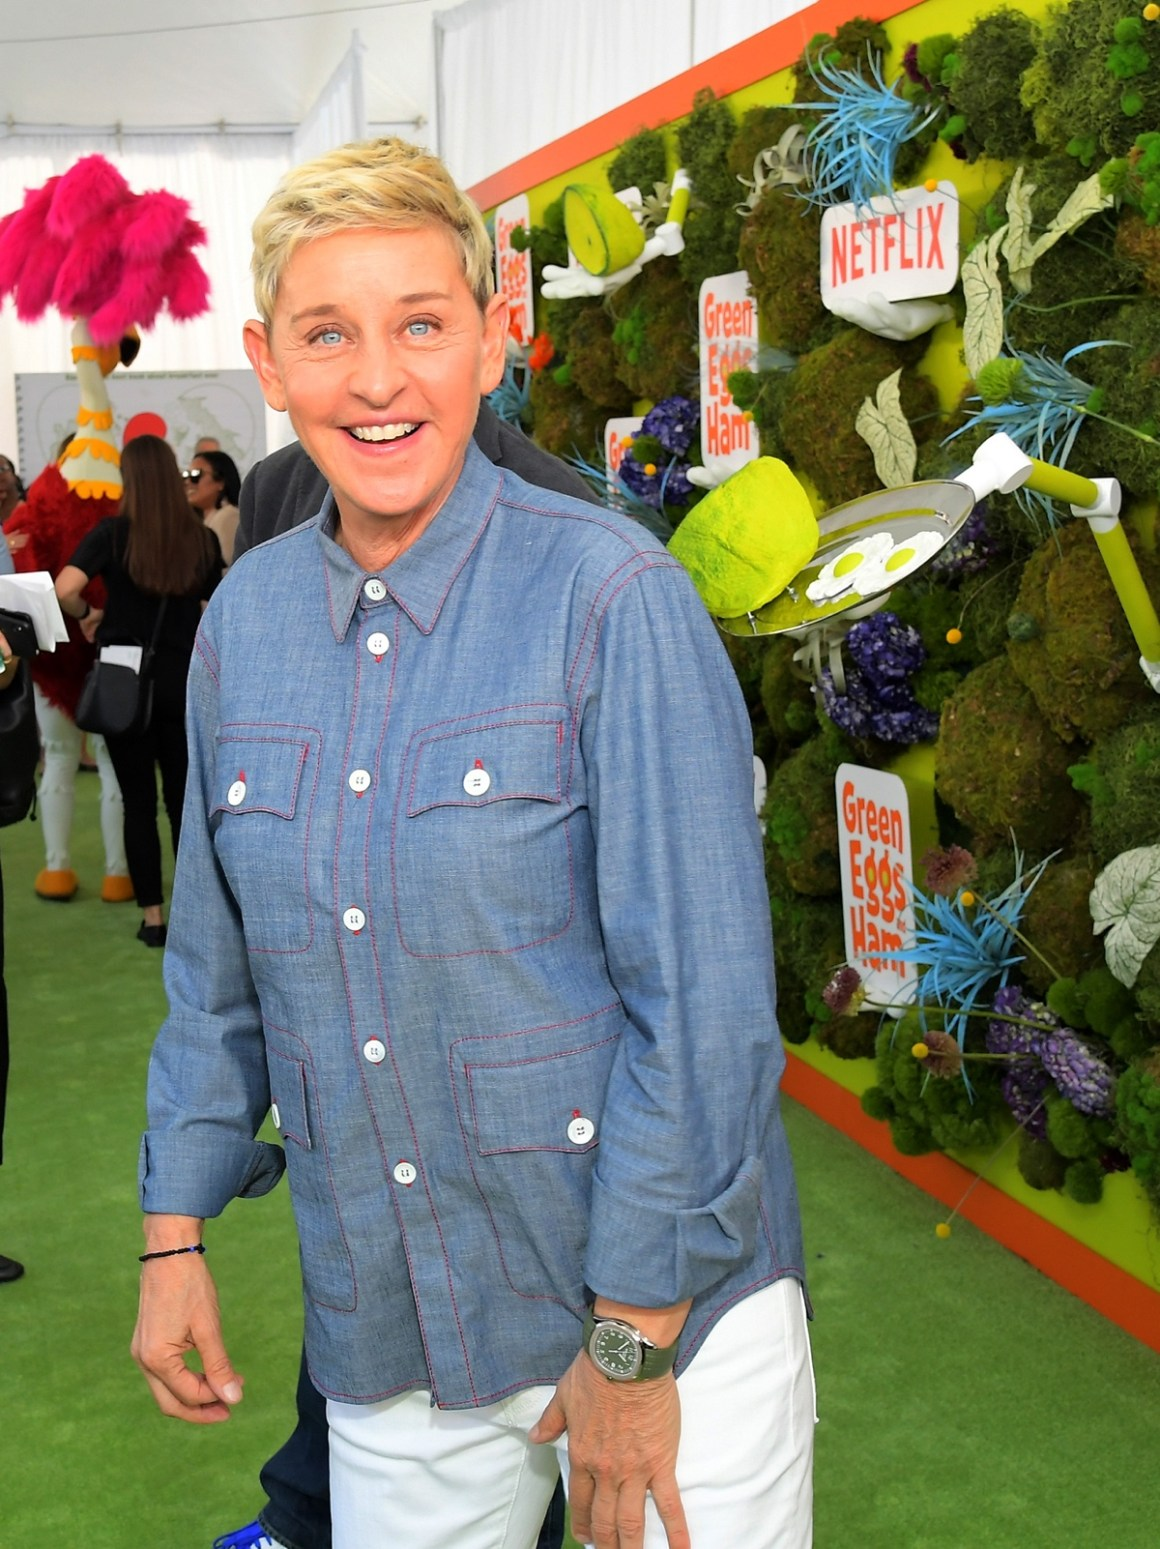 Ellen Degeneres Netflix 'Green Eggs & Ham' Los Angeles Premiere